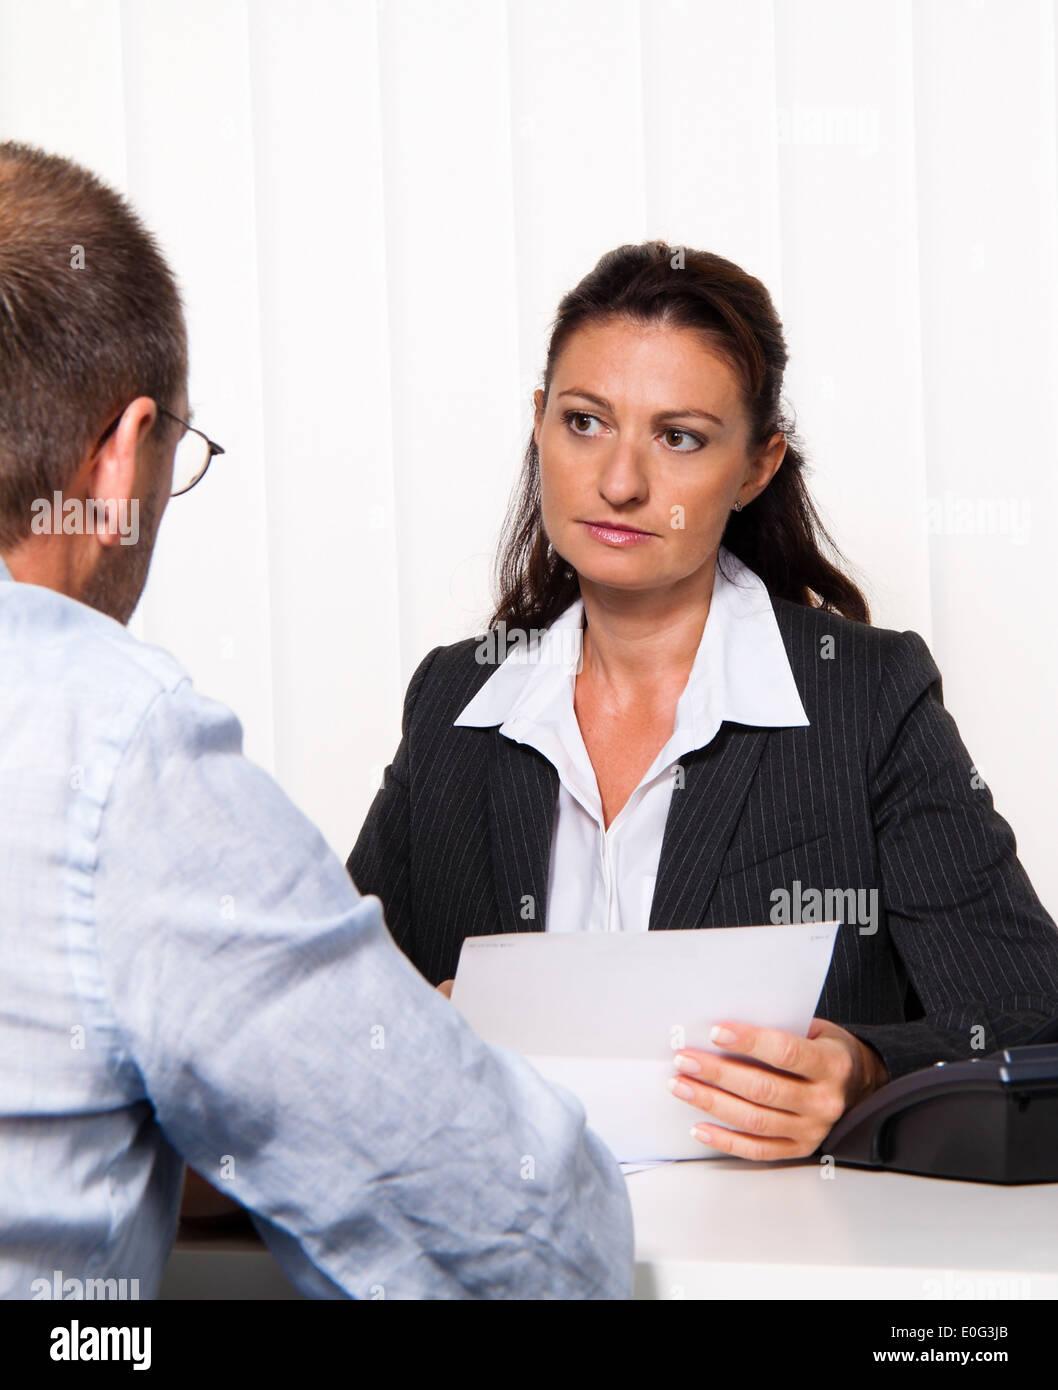 Conversation and consultation with lawyer or tax adviser, Gespraech und Beratung bei Rechtsanwalt oder Steuerberater - Stock Image